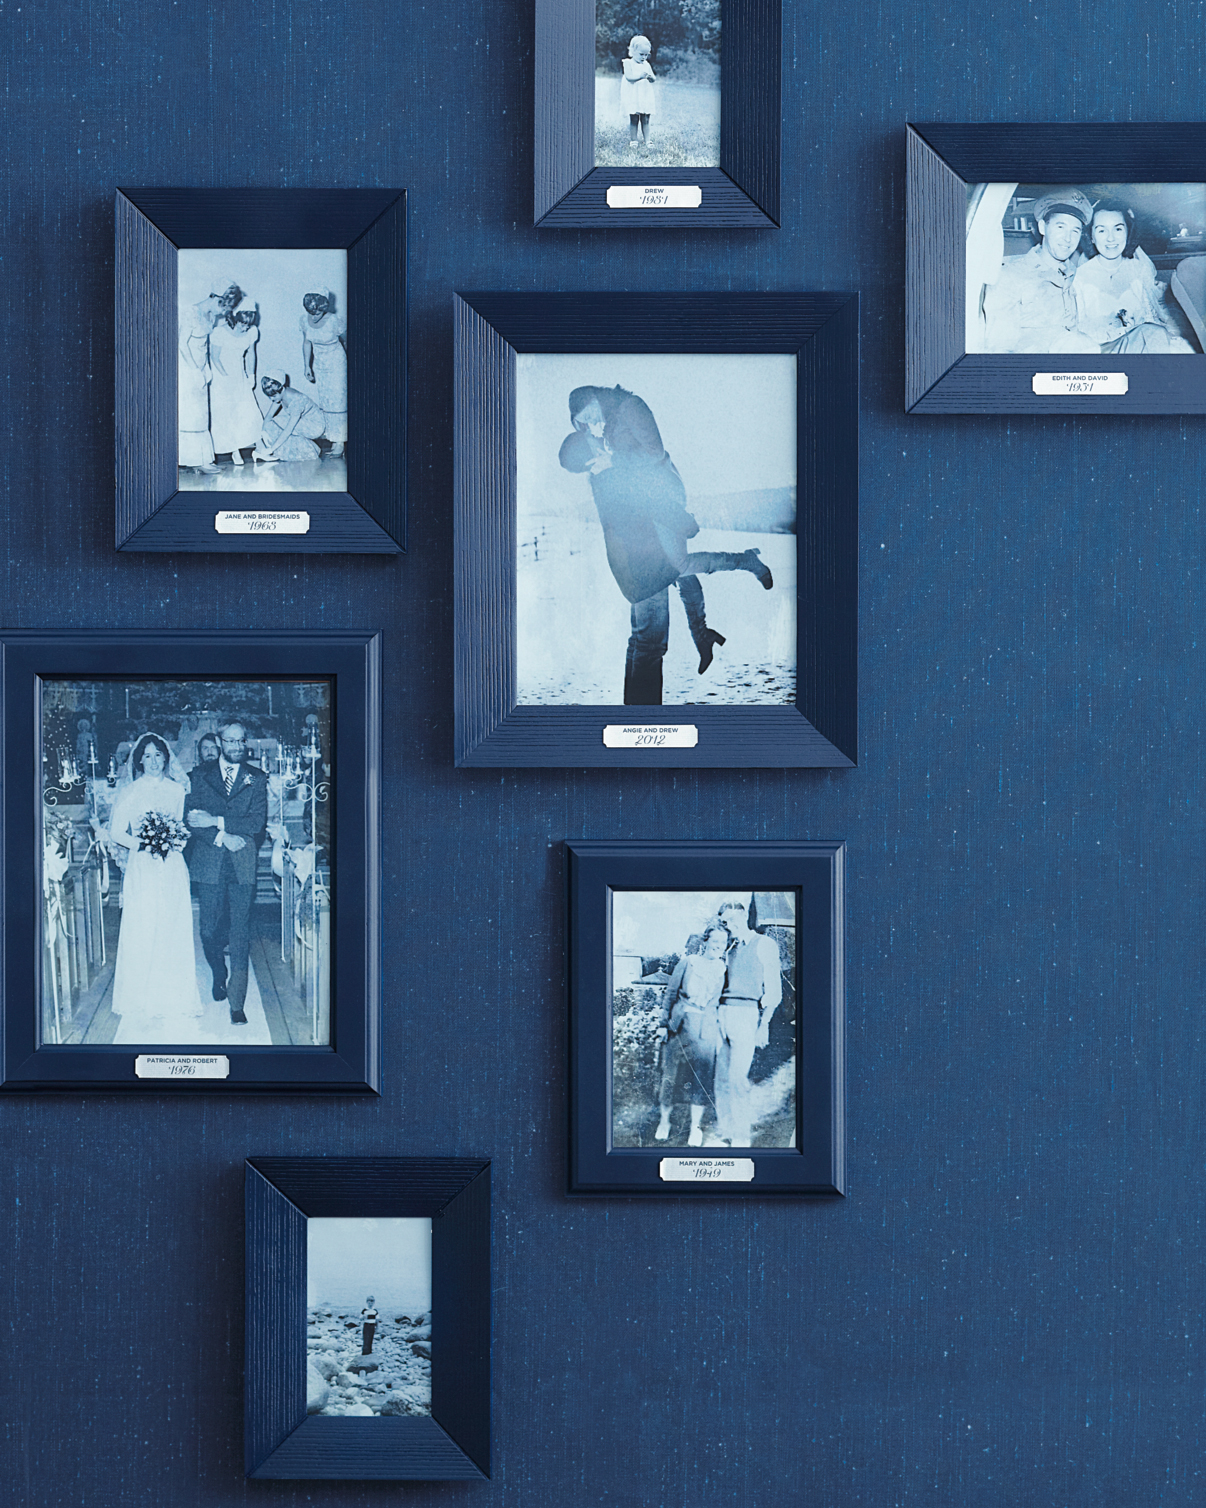 palette-blue-photos-mwd108489.jpg